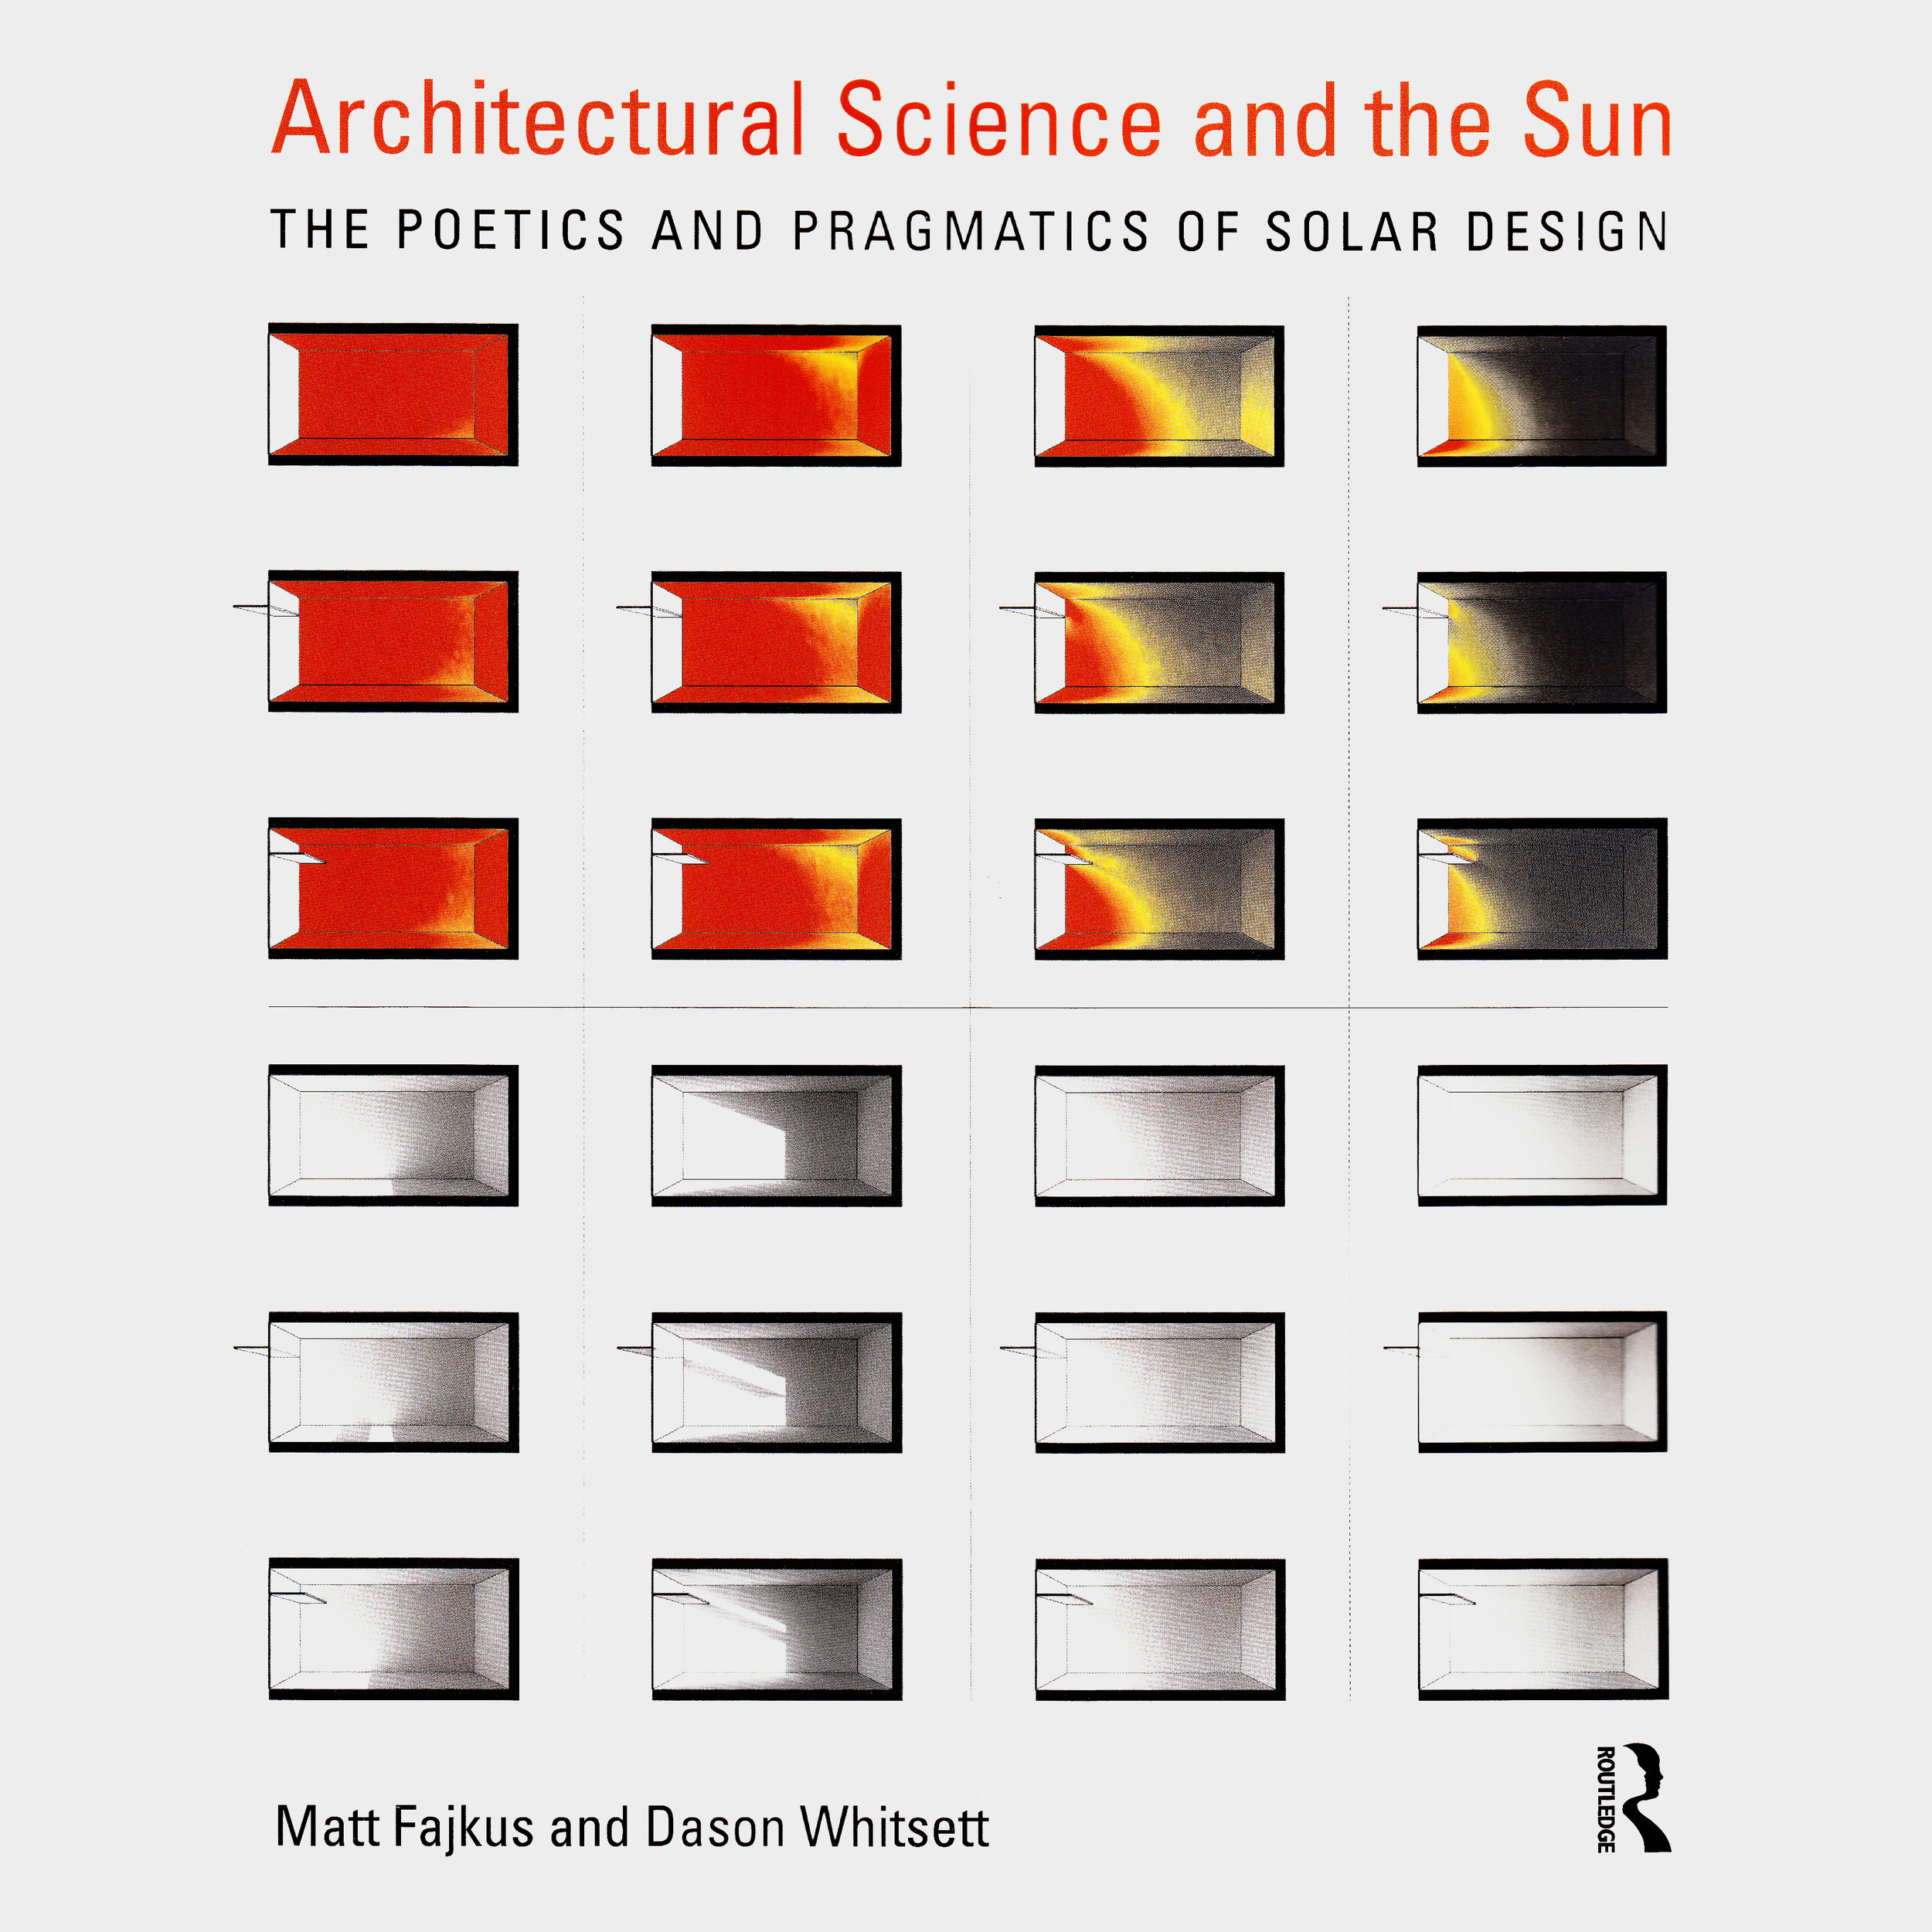 Architectural Science and the Sun by Matt Fajkus and Dason Whitsett-3.jpg